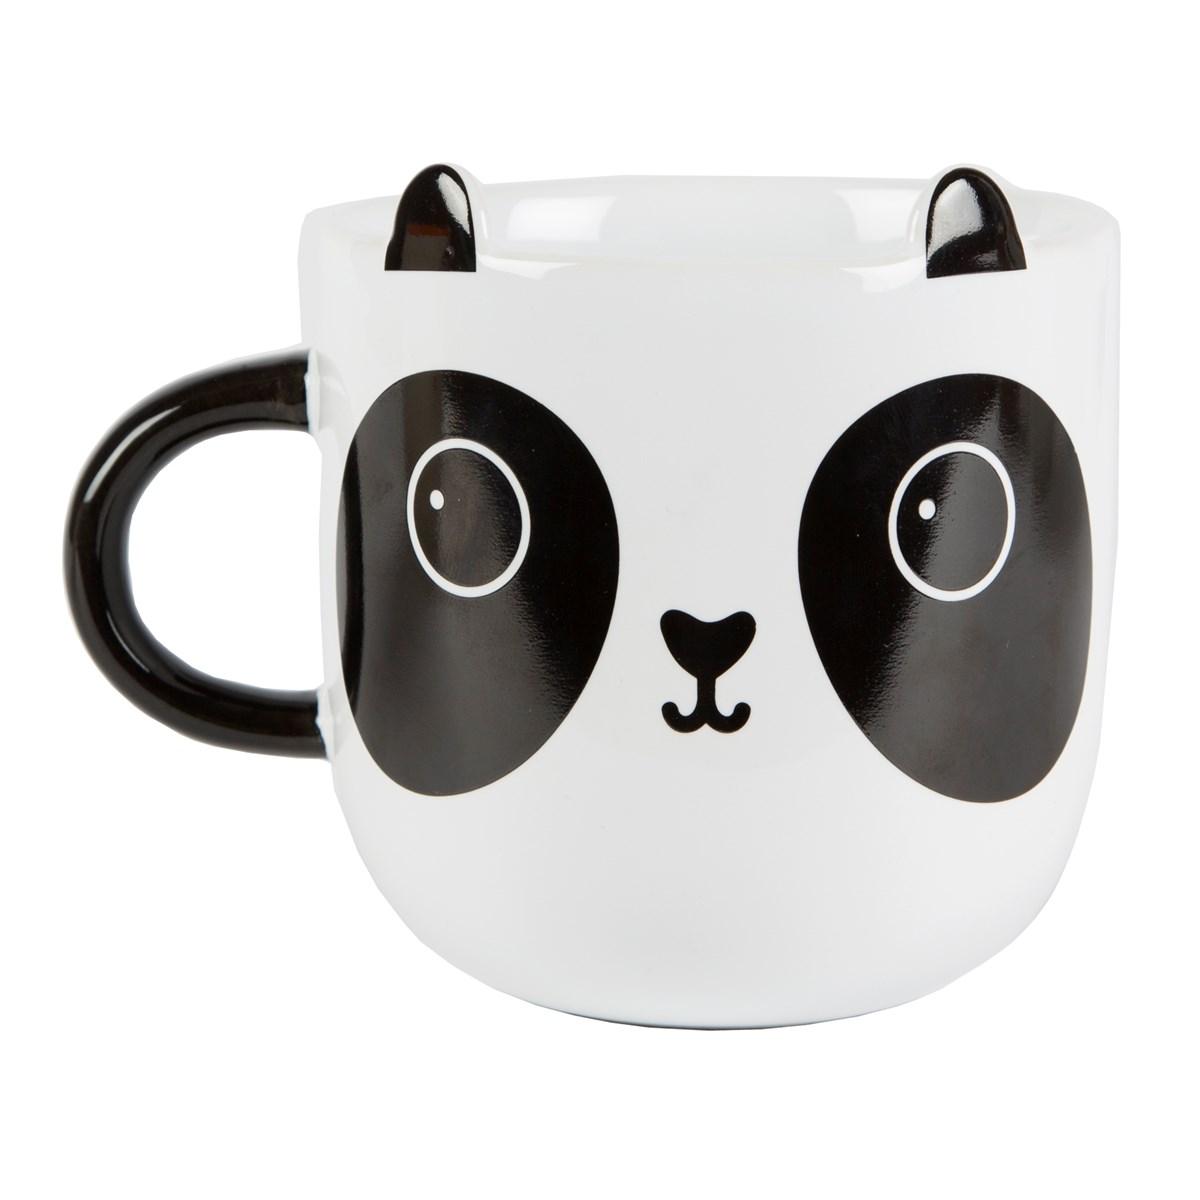 Objet panda @bonjourbibiche